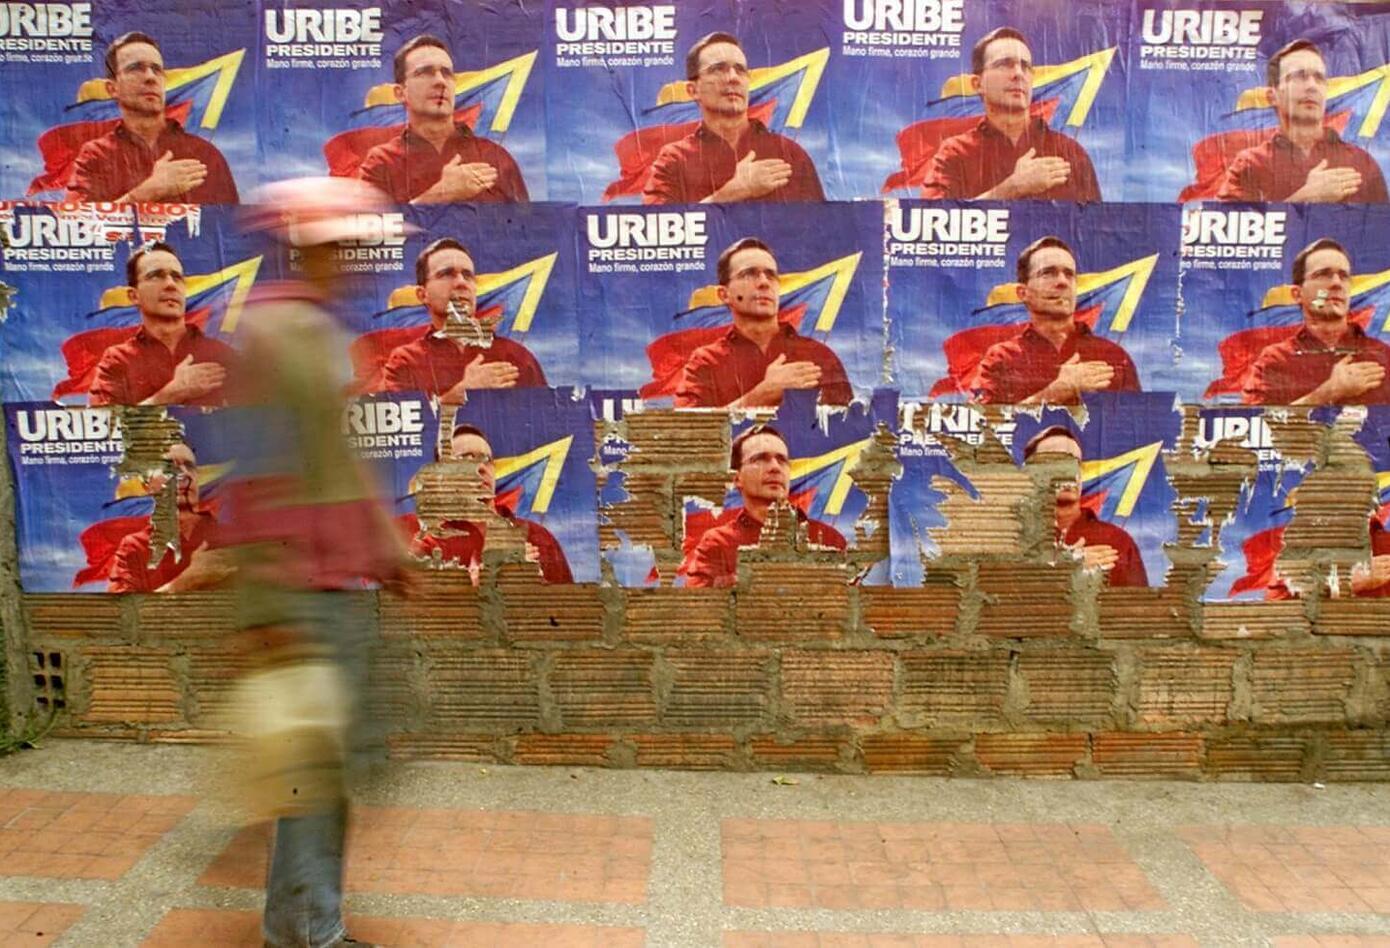 campaña de Uribe en 2002